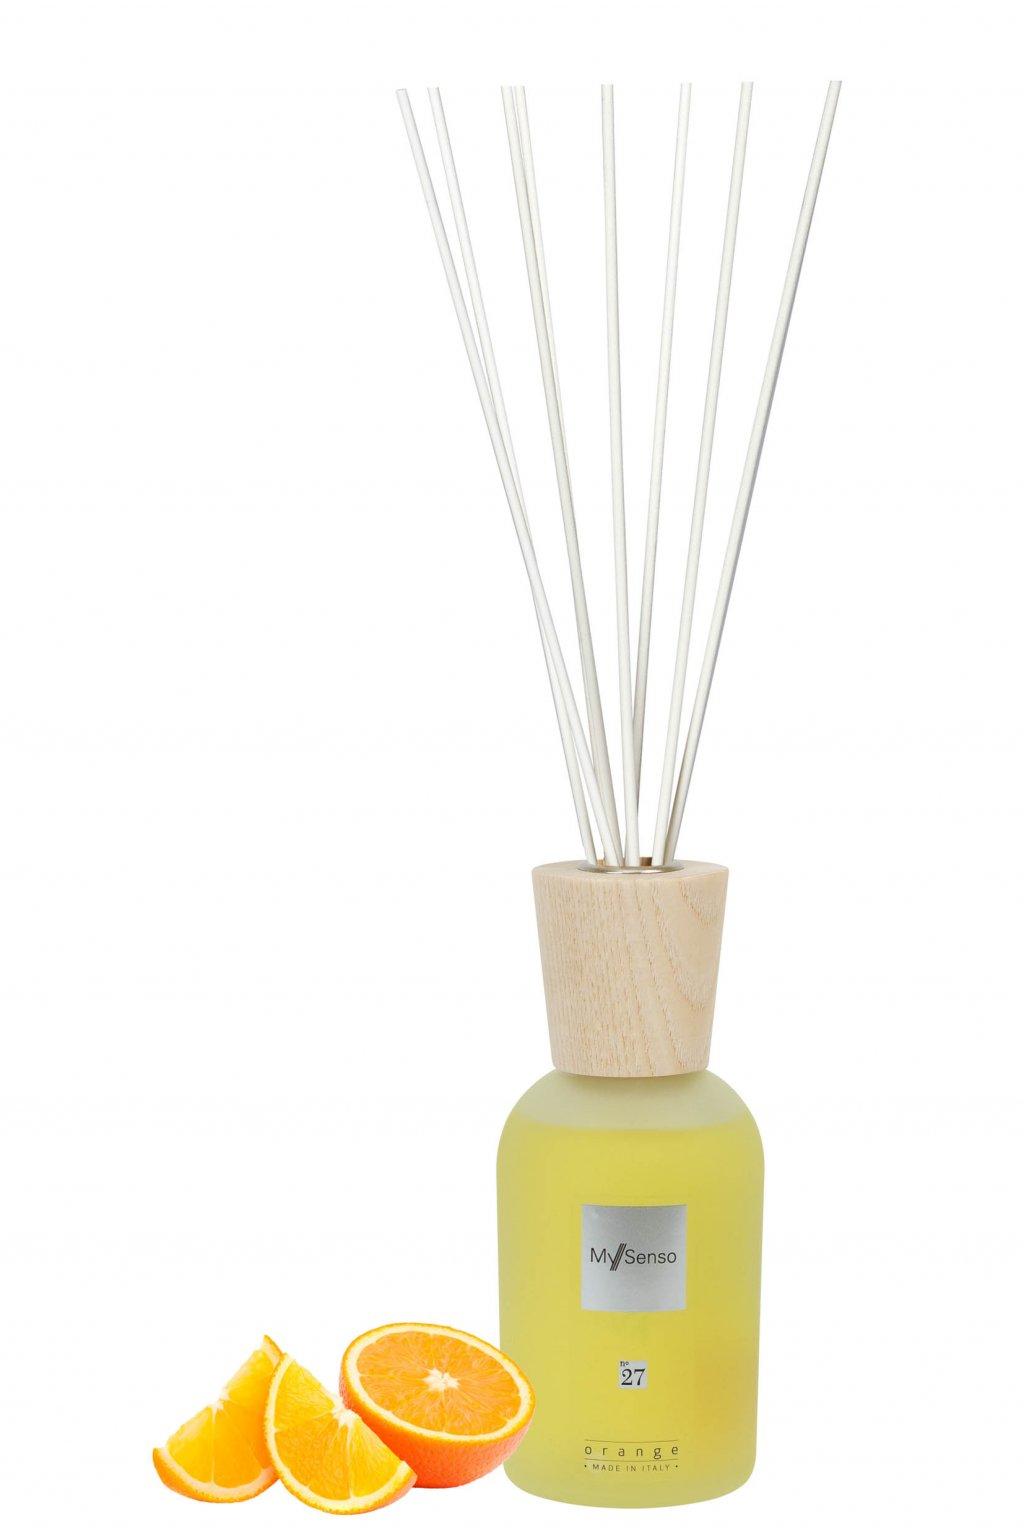 138 my senso aromaticky difuzer premium n 27 orange 240ml pomeranc